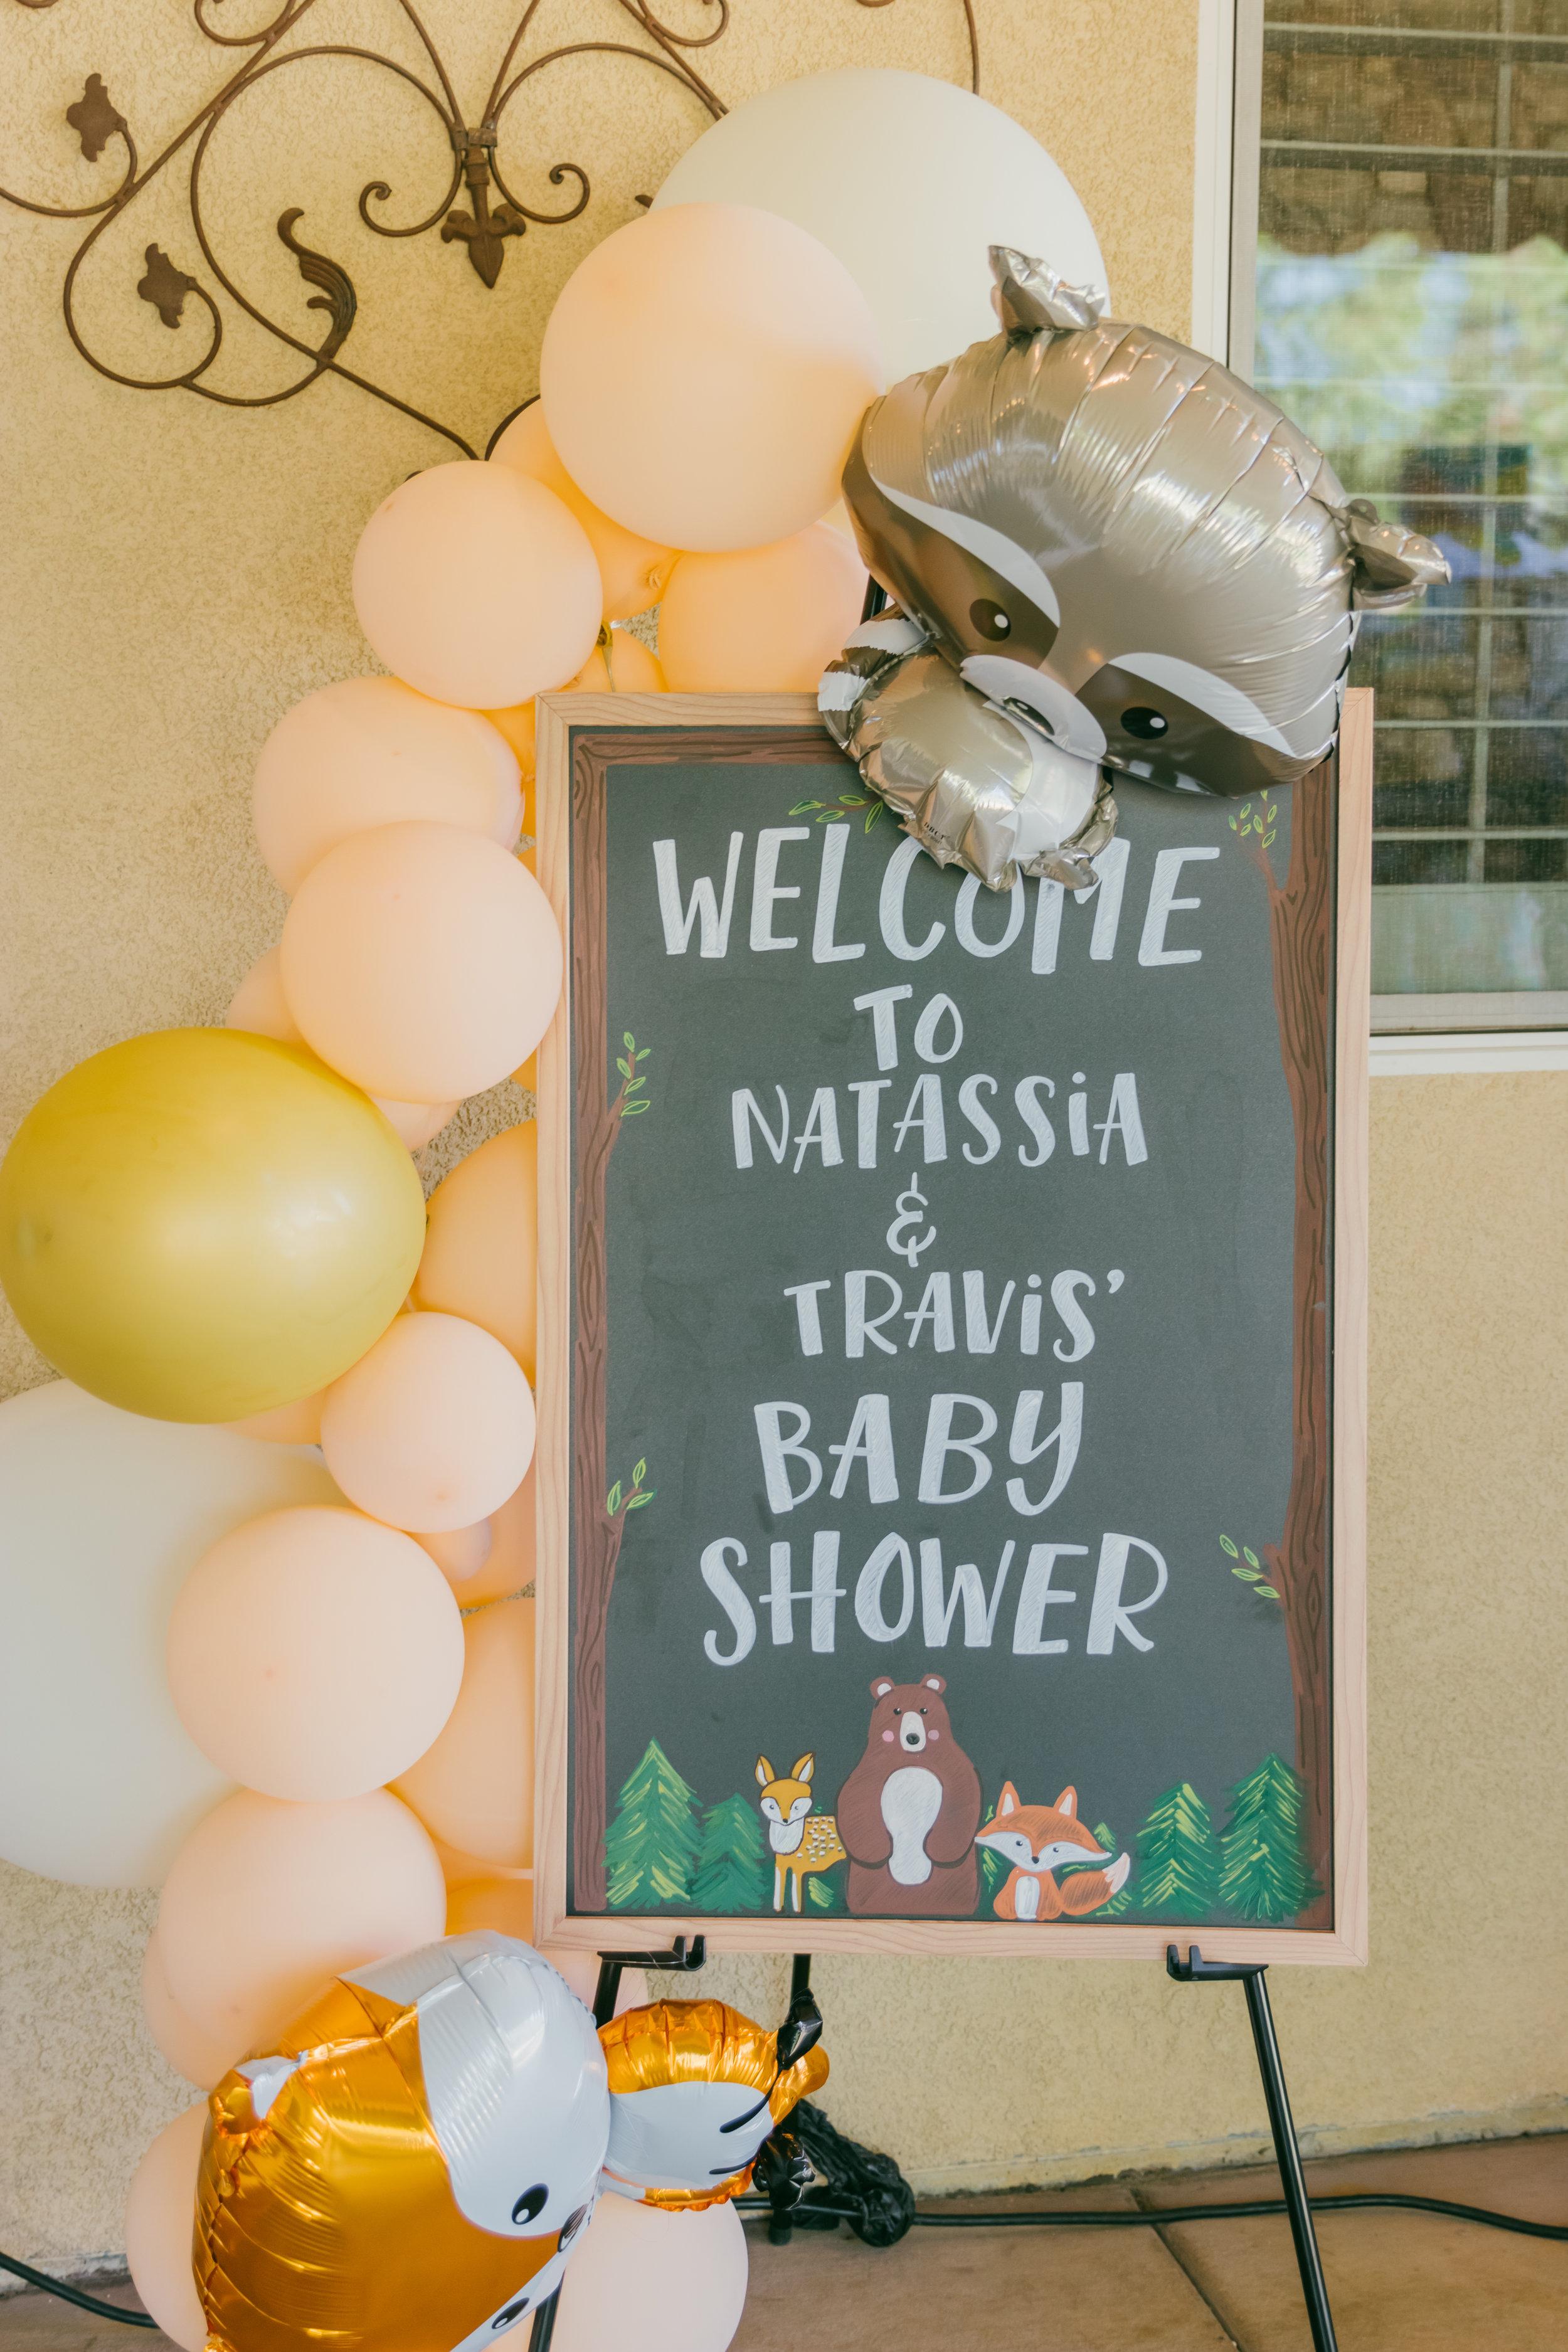 002_baby_shower.jpg